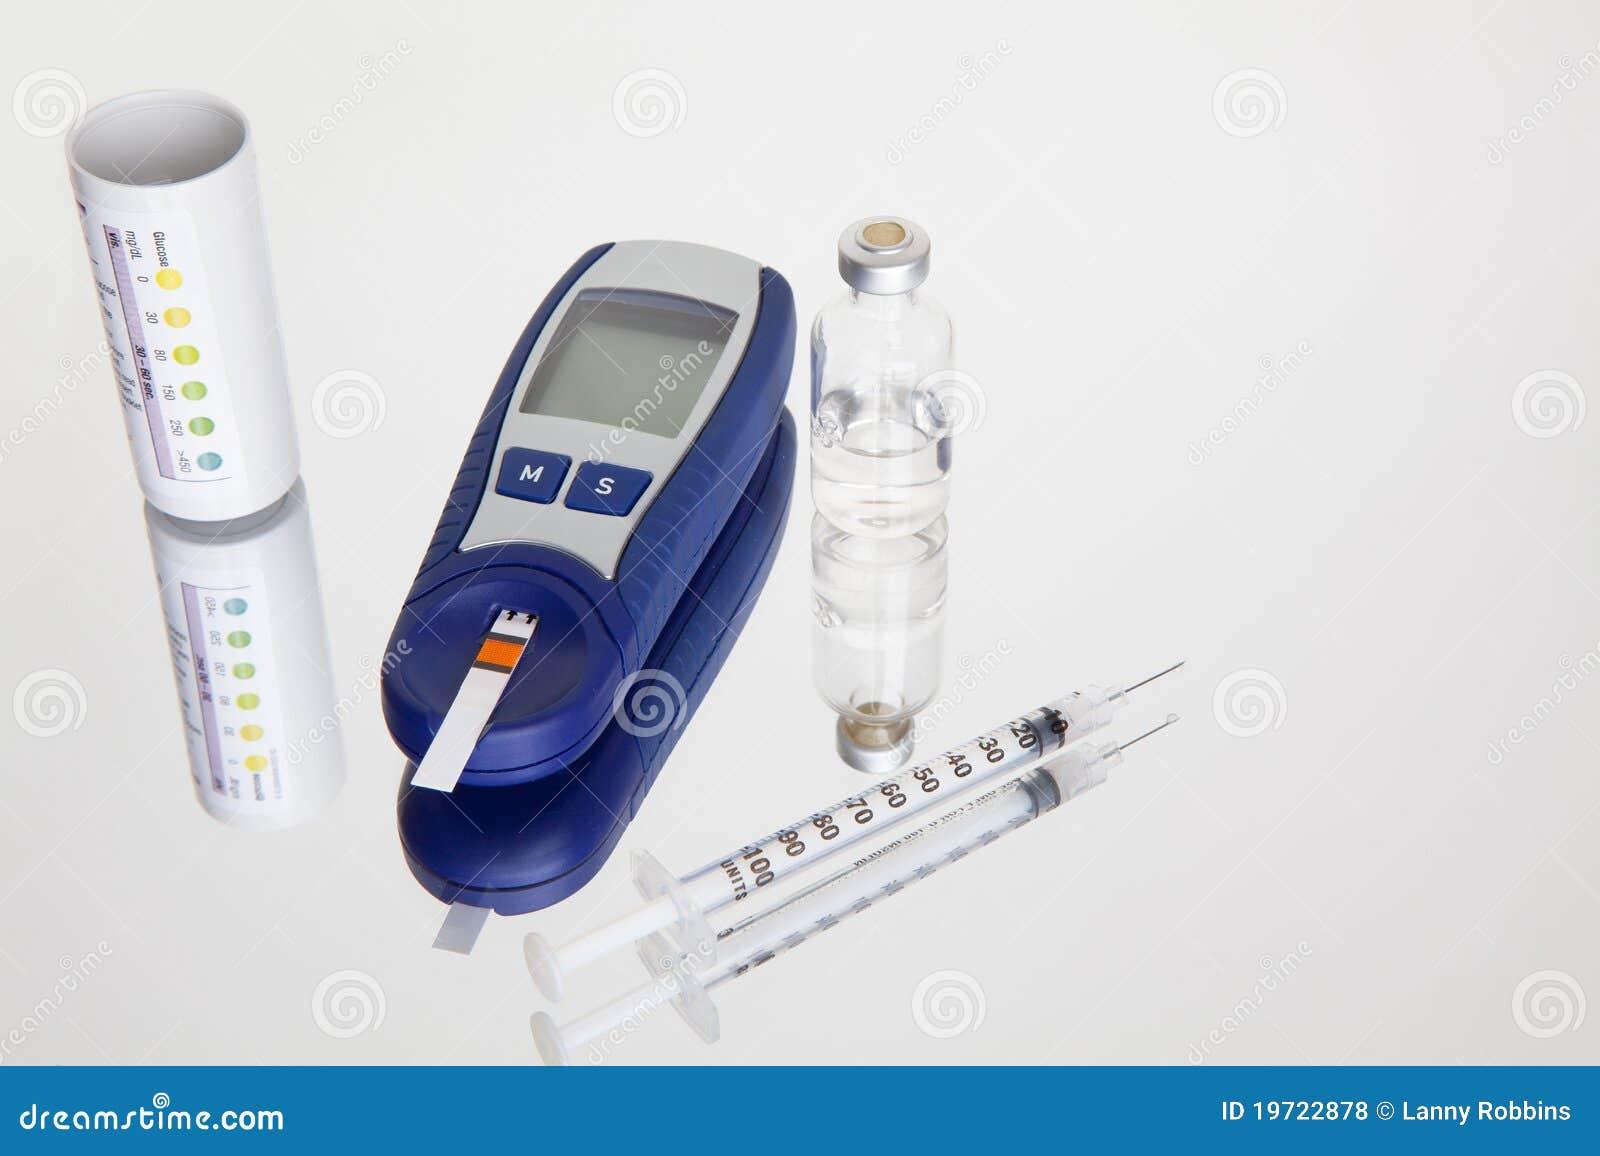 DIABTE - Fdration Franaise de Cardiologie